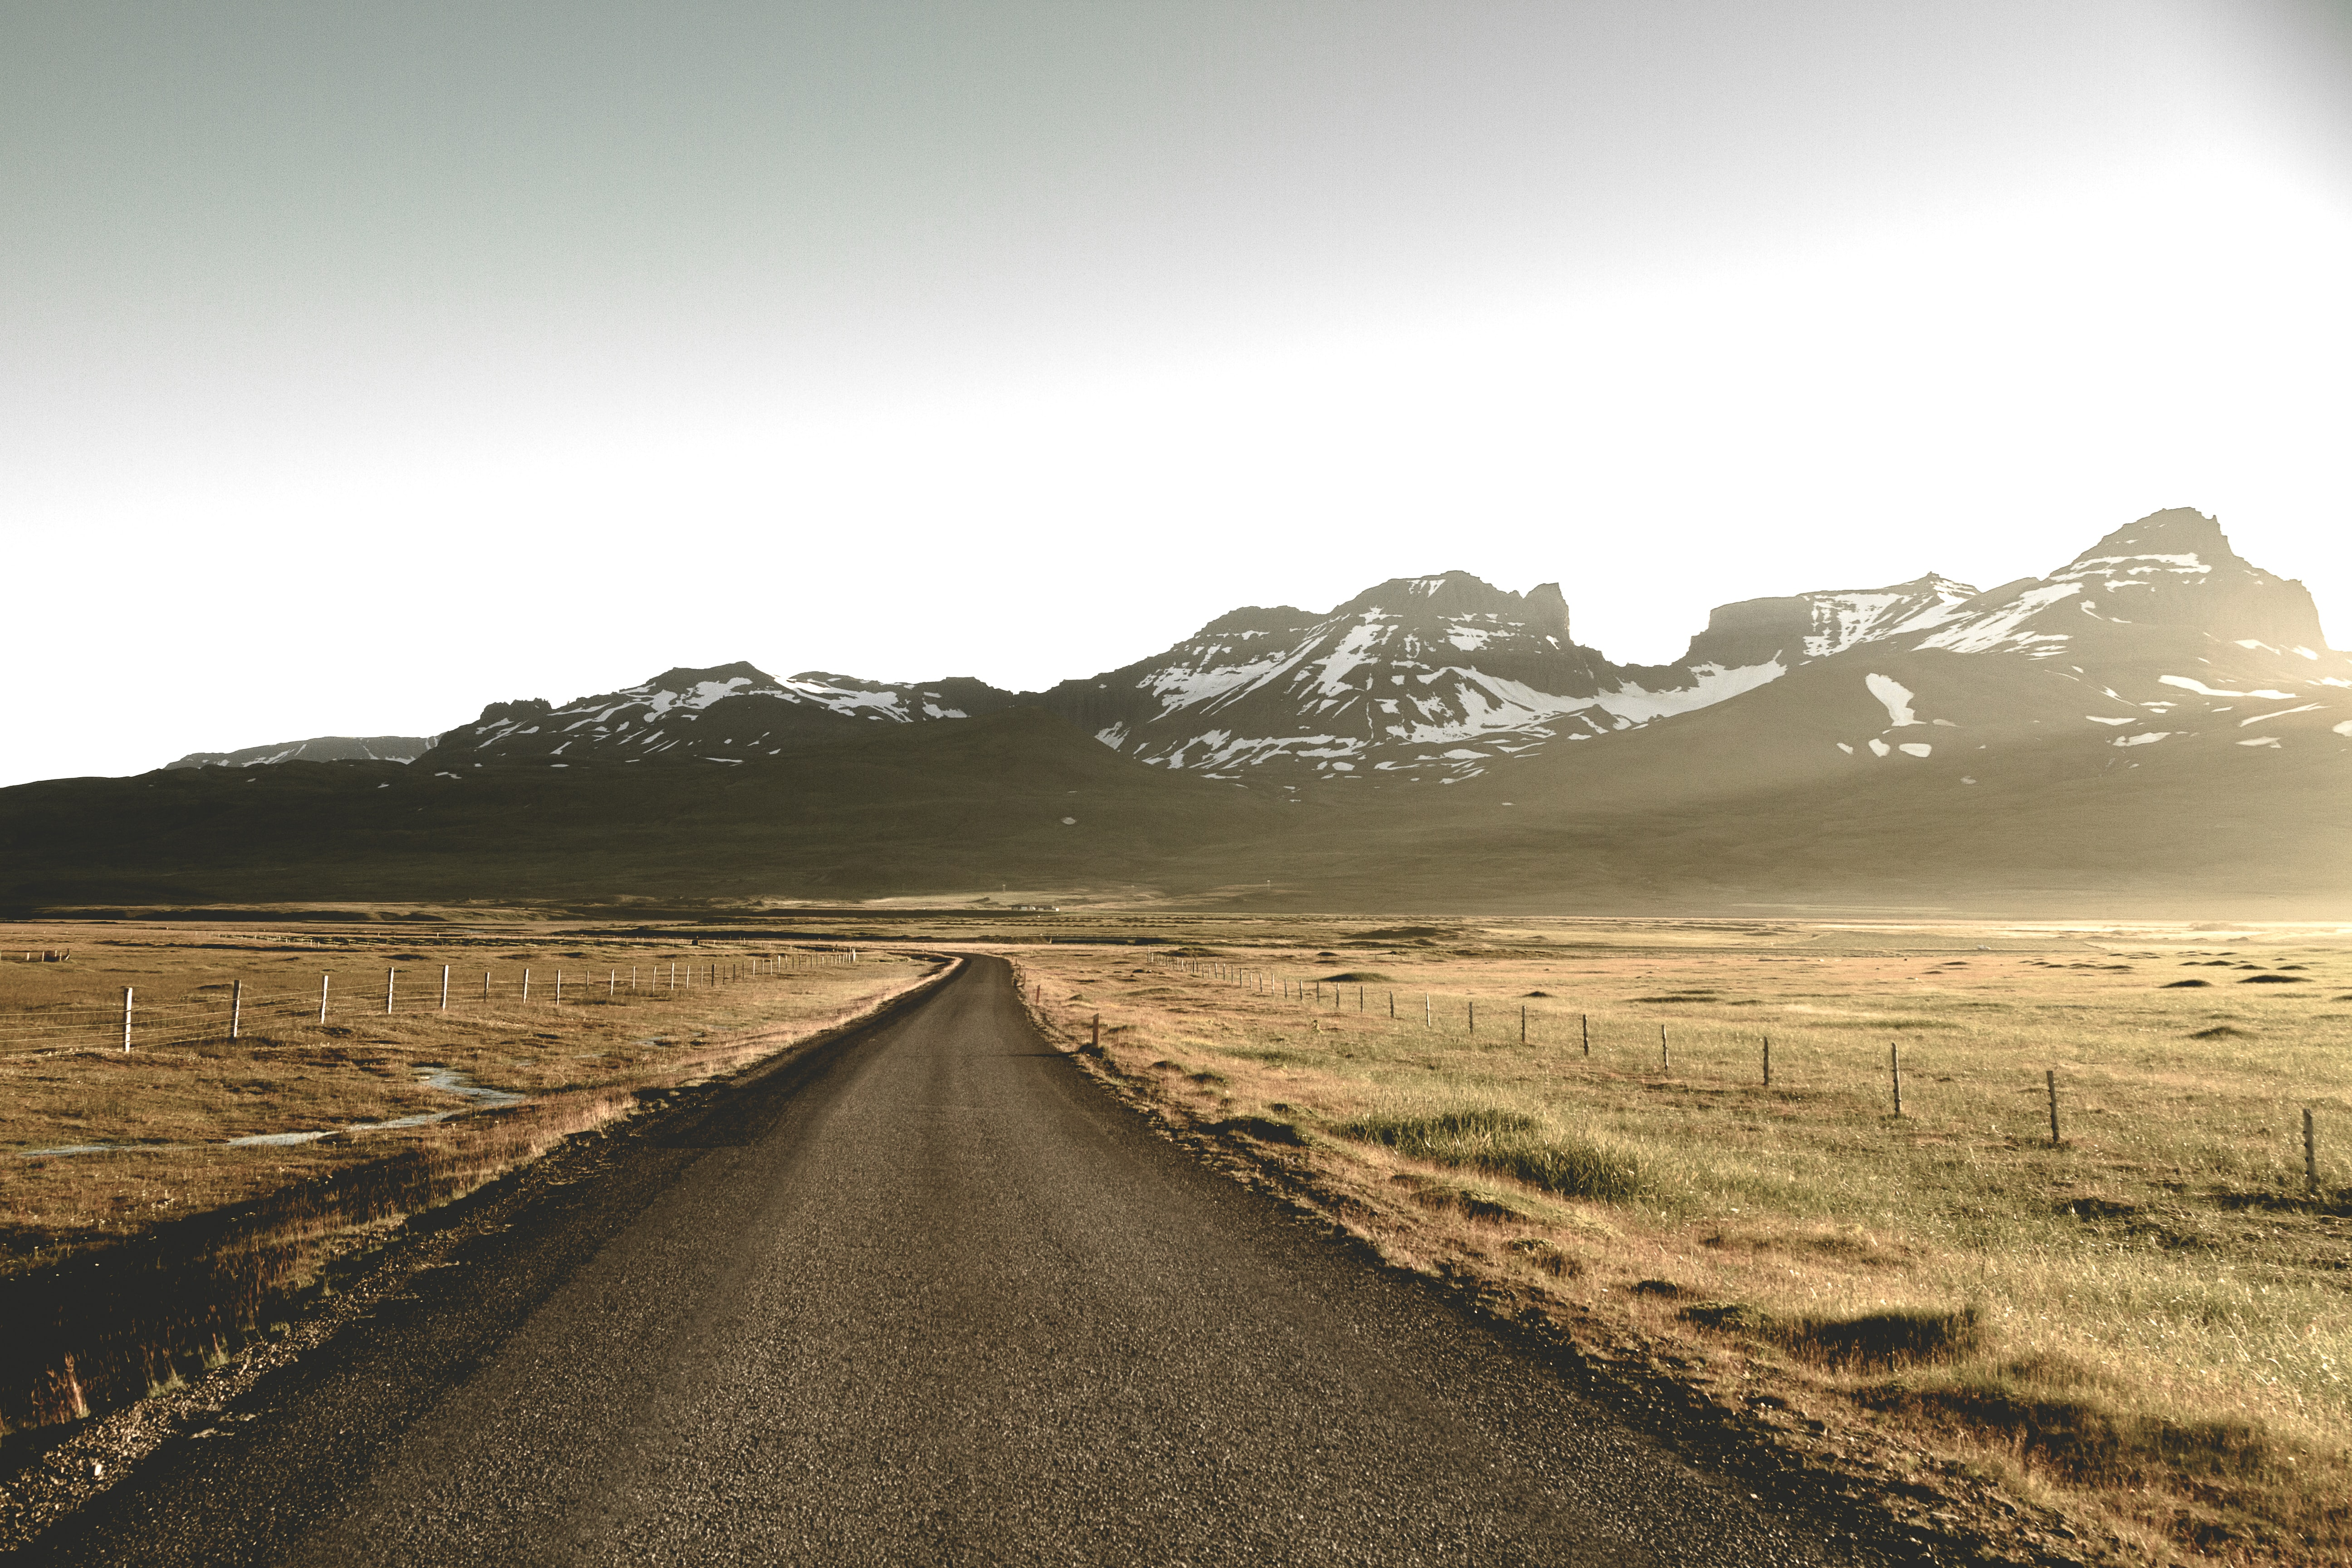 dirt road between steppe